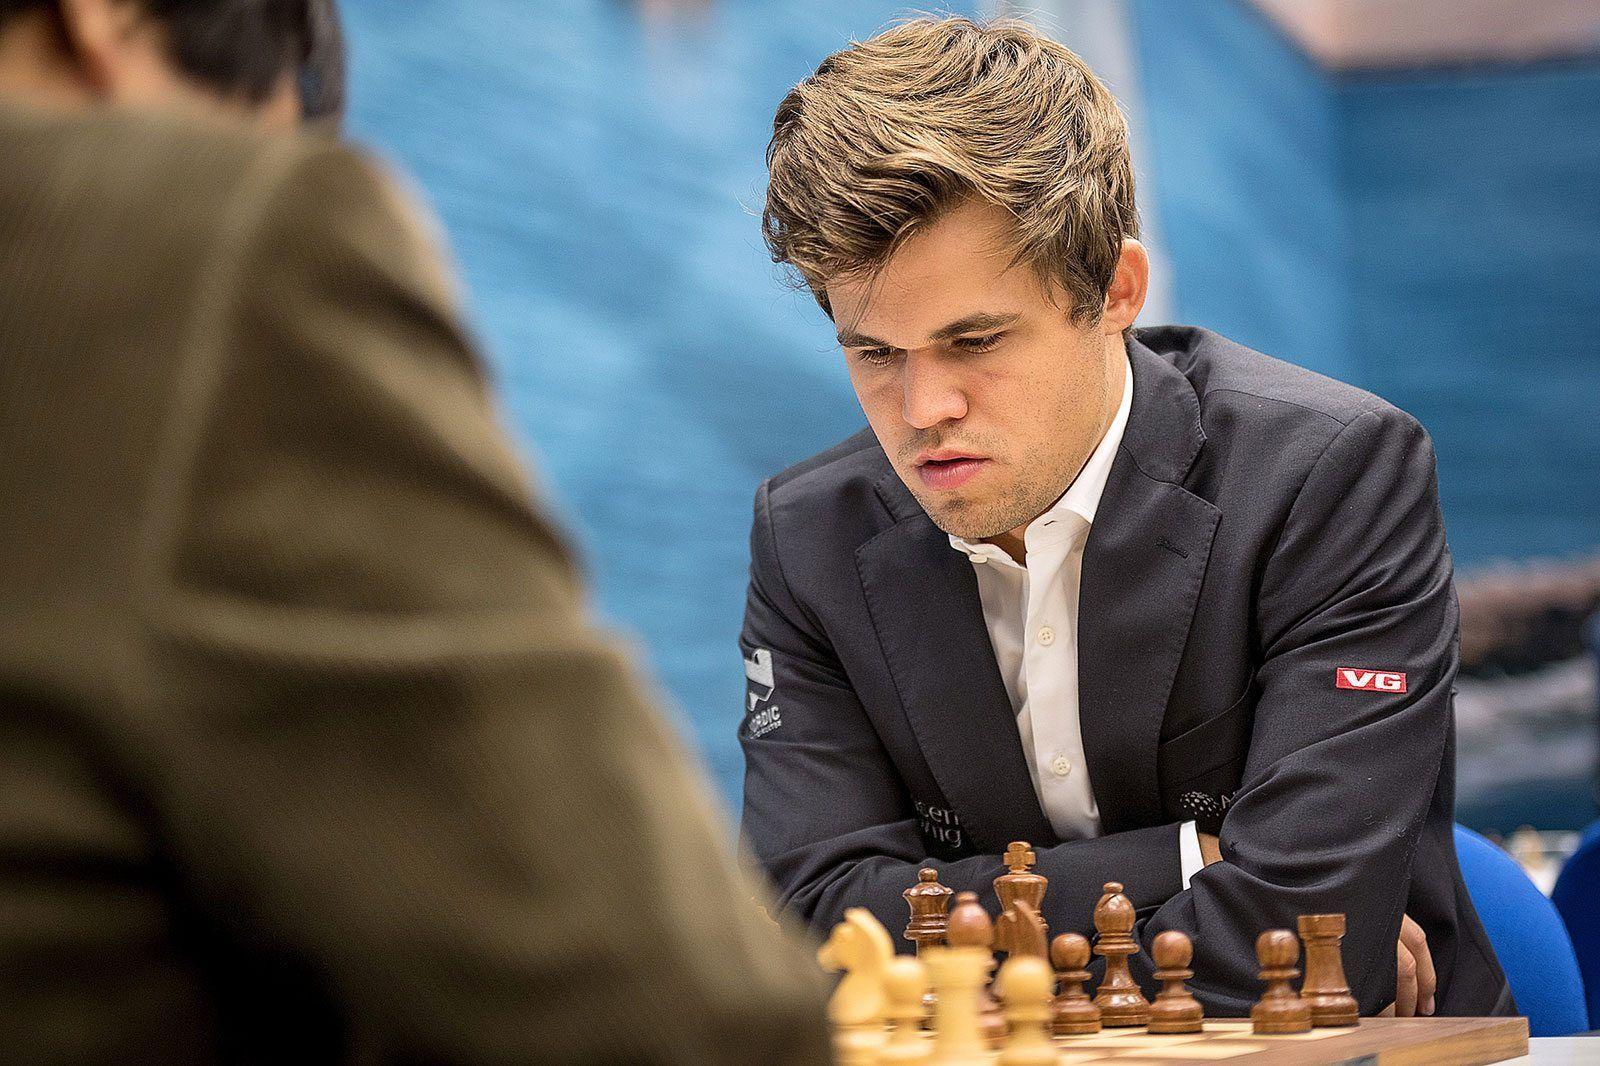 vg live sjakk